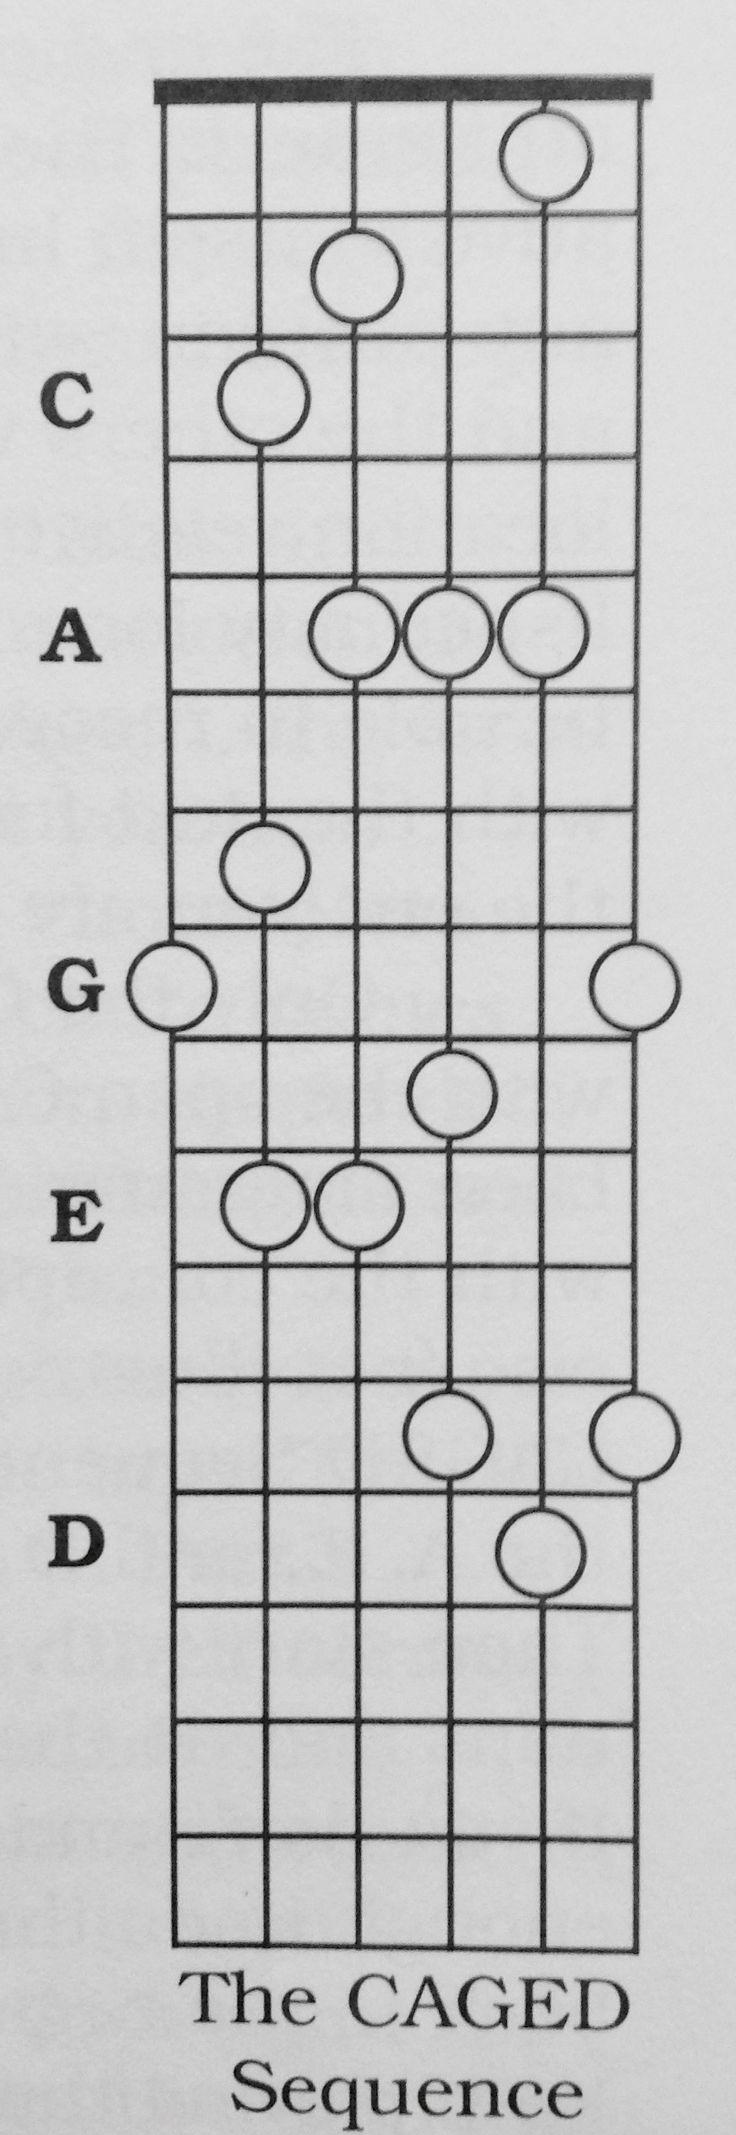 196 best images about Guitar Gear on Pinterest   Acoustic guitars ...